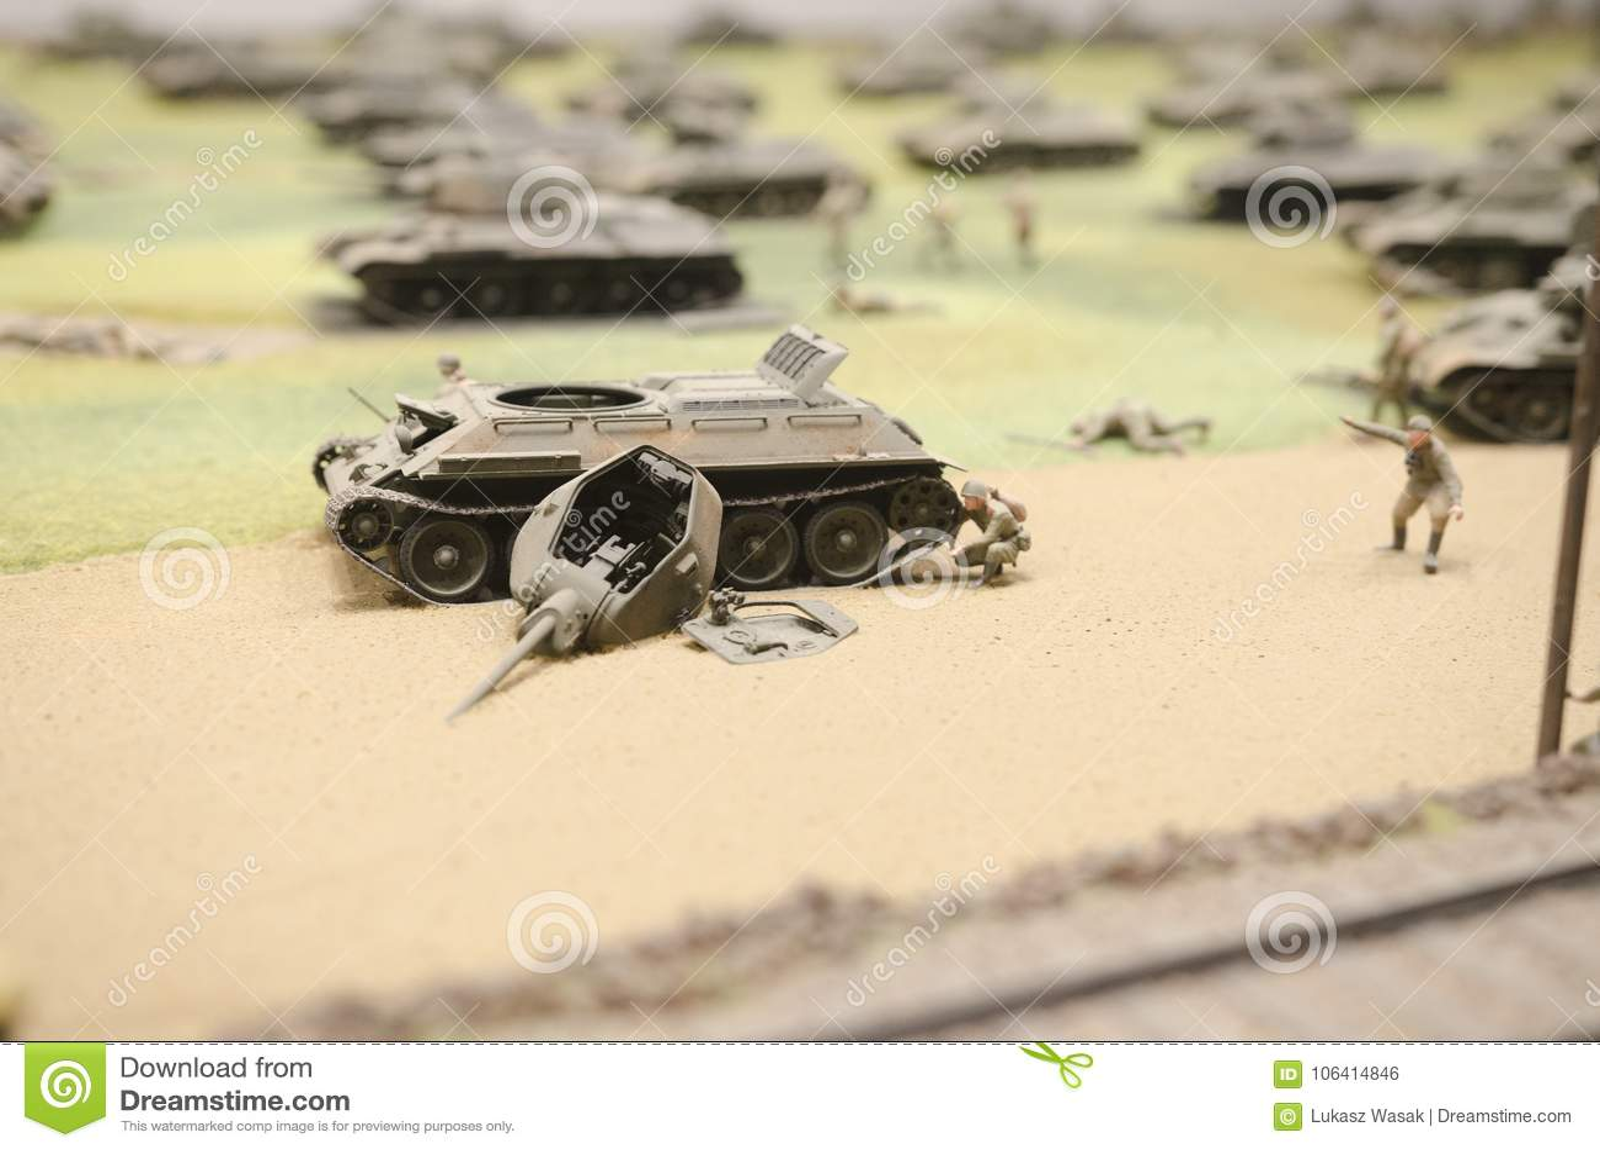 Soviet Tank Wreck After Operation Prokhorovka, 1943 Stock Photo